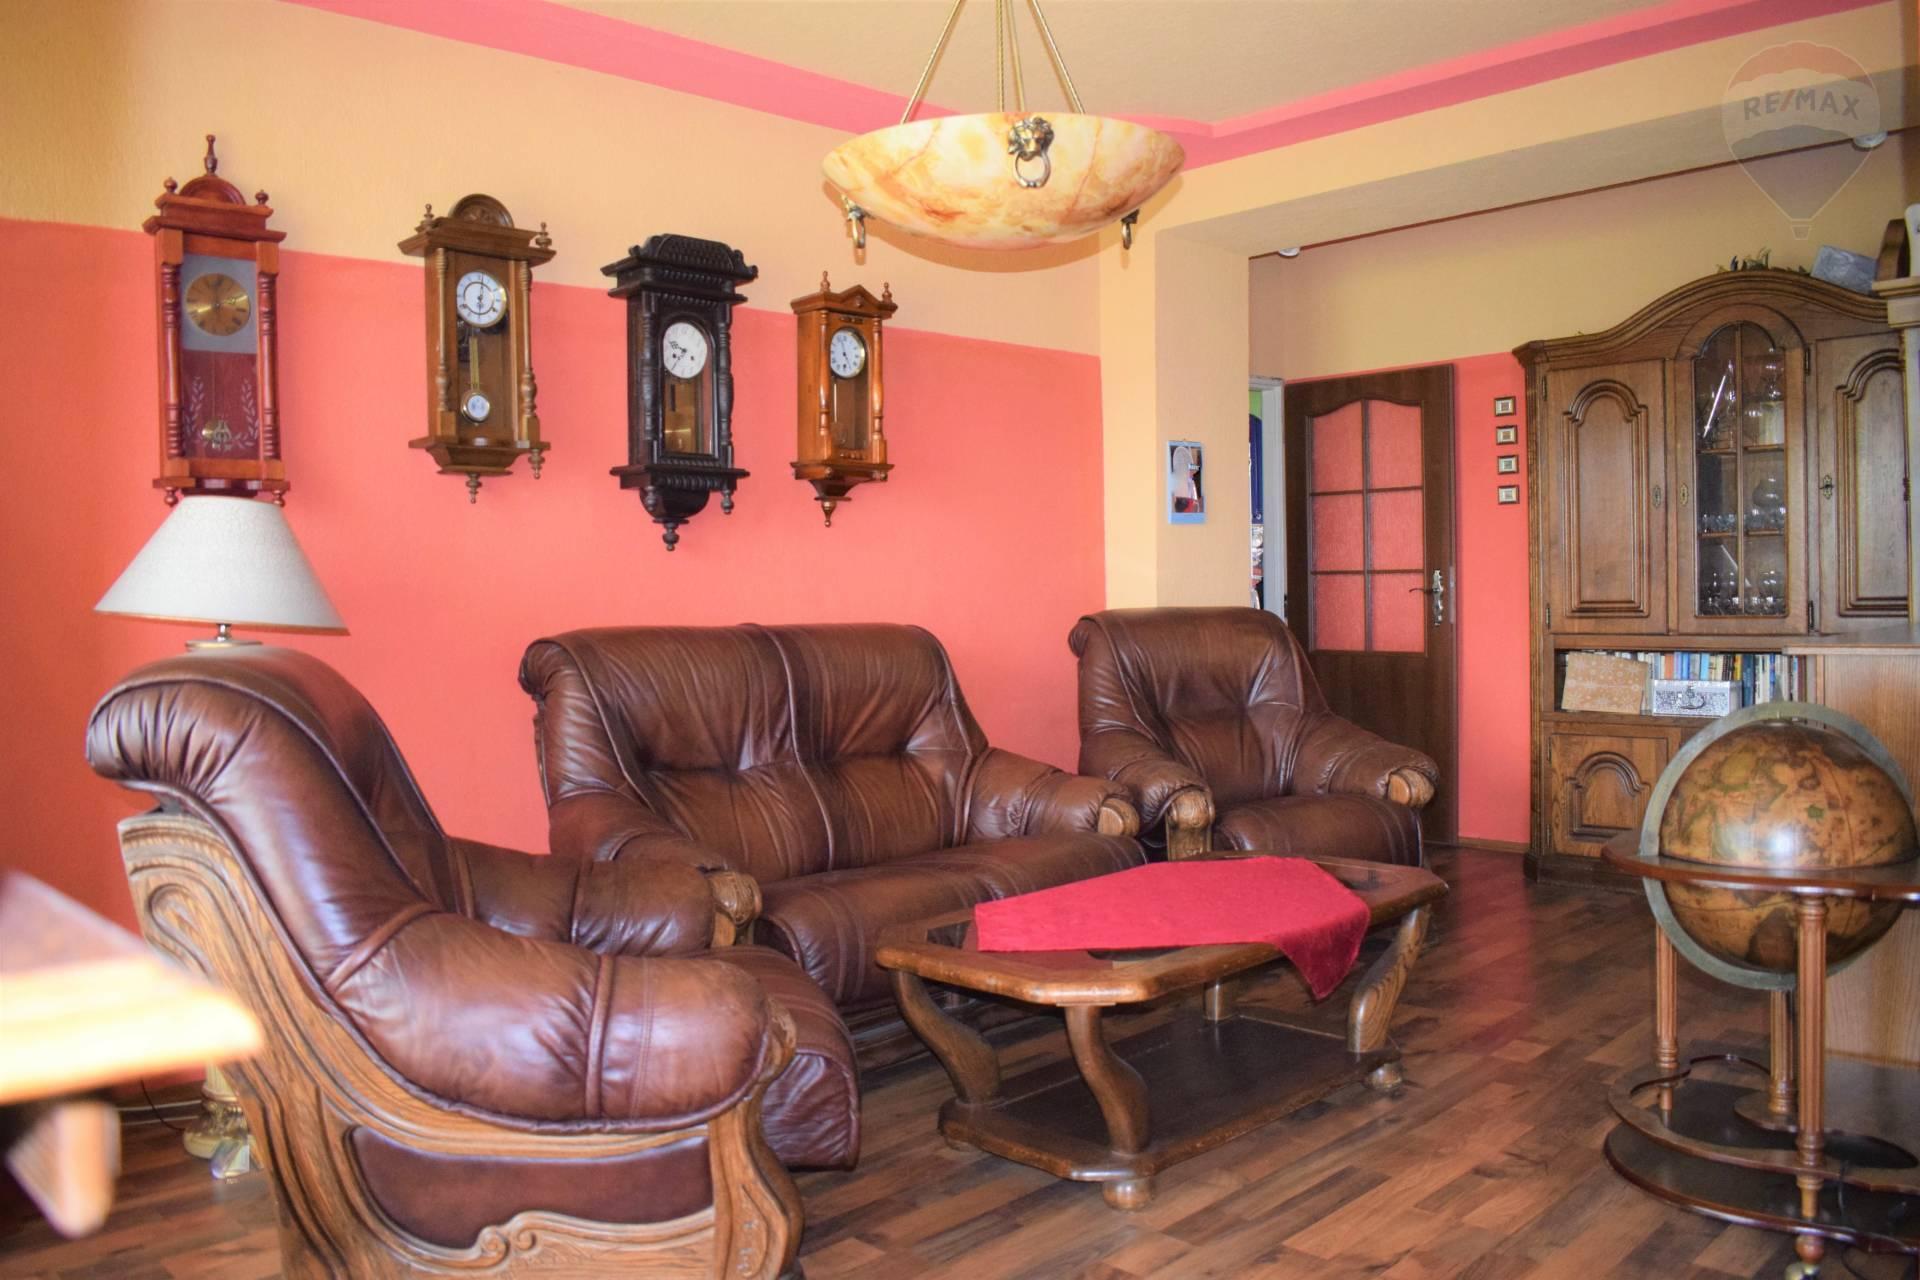 3 izbový byt na Puškinovej ulici v Humennom, na predaj